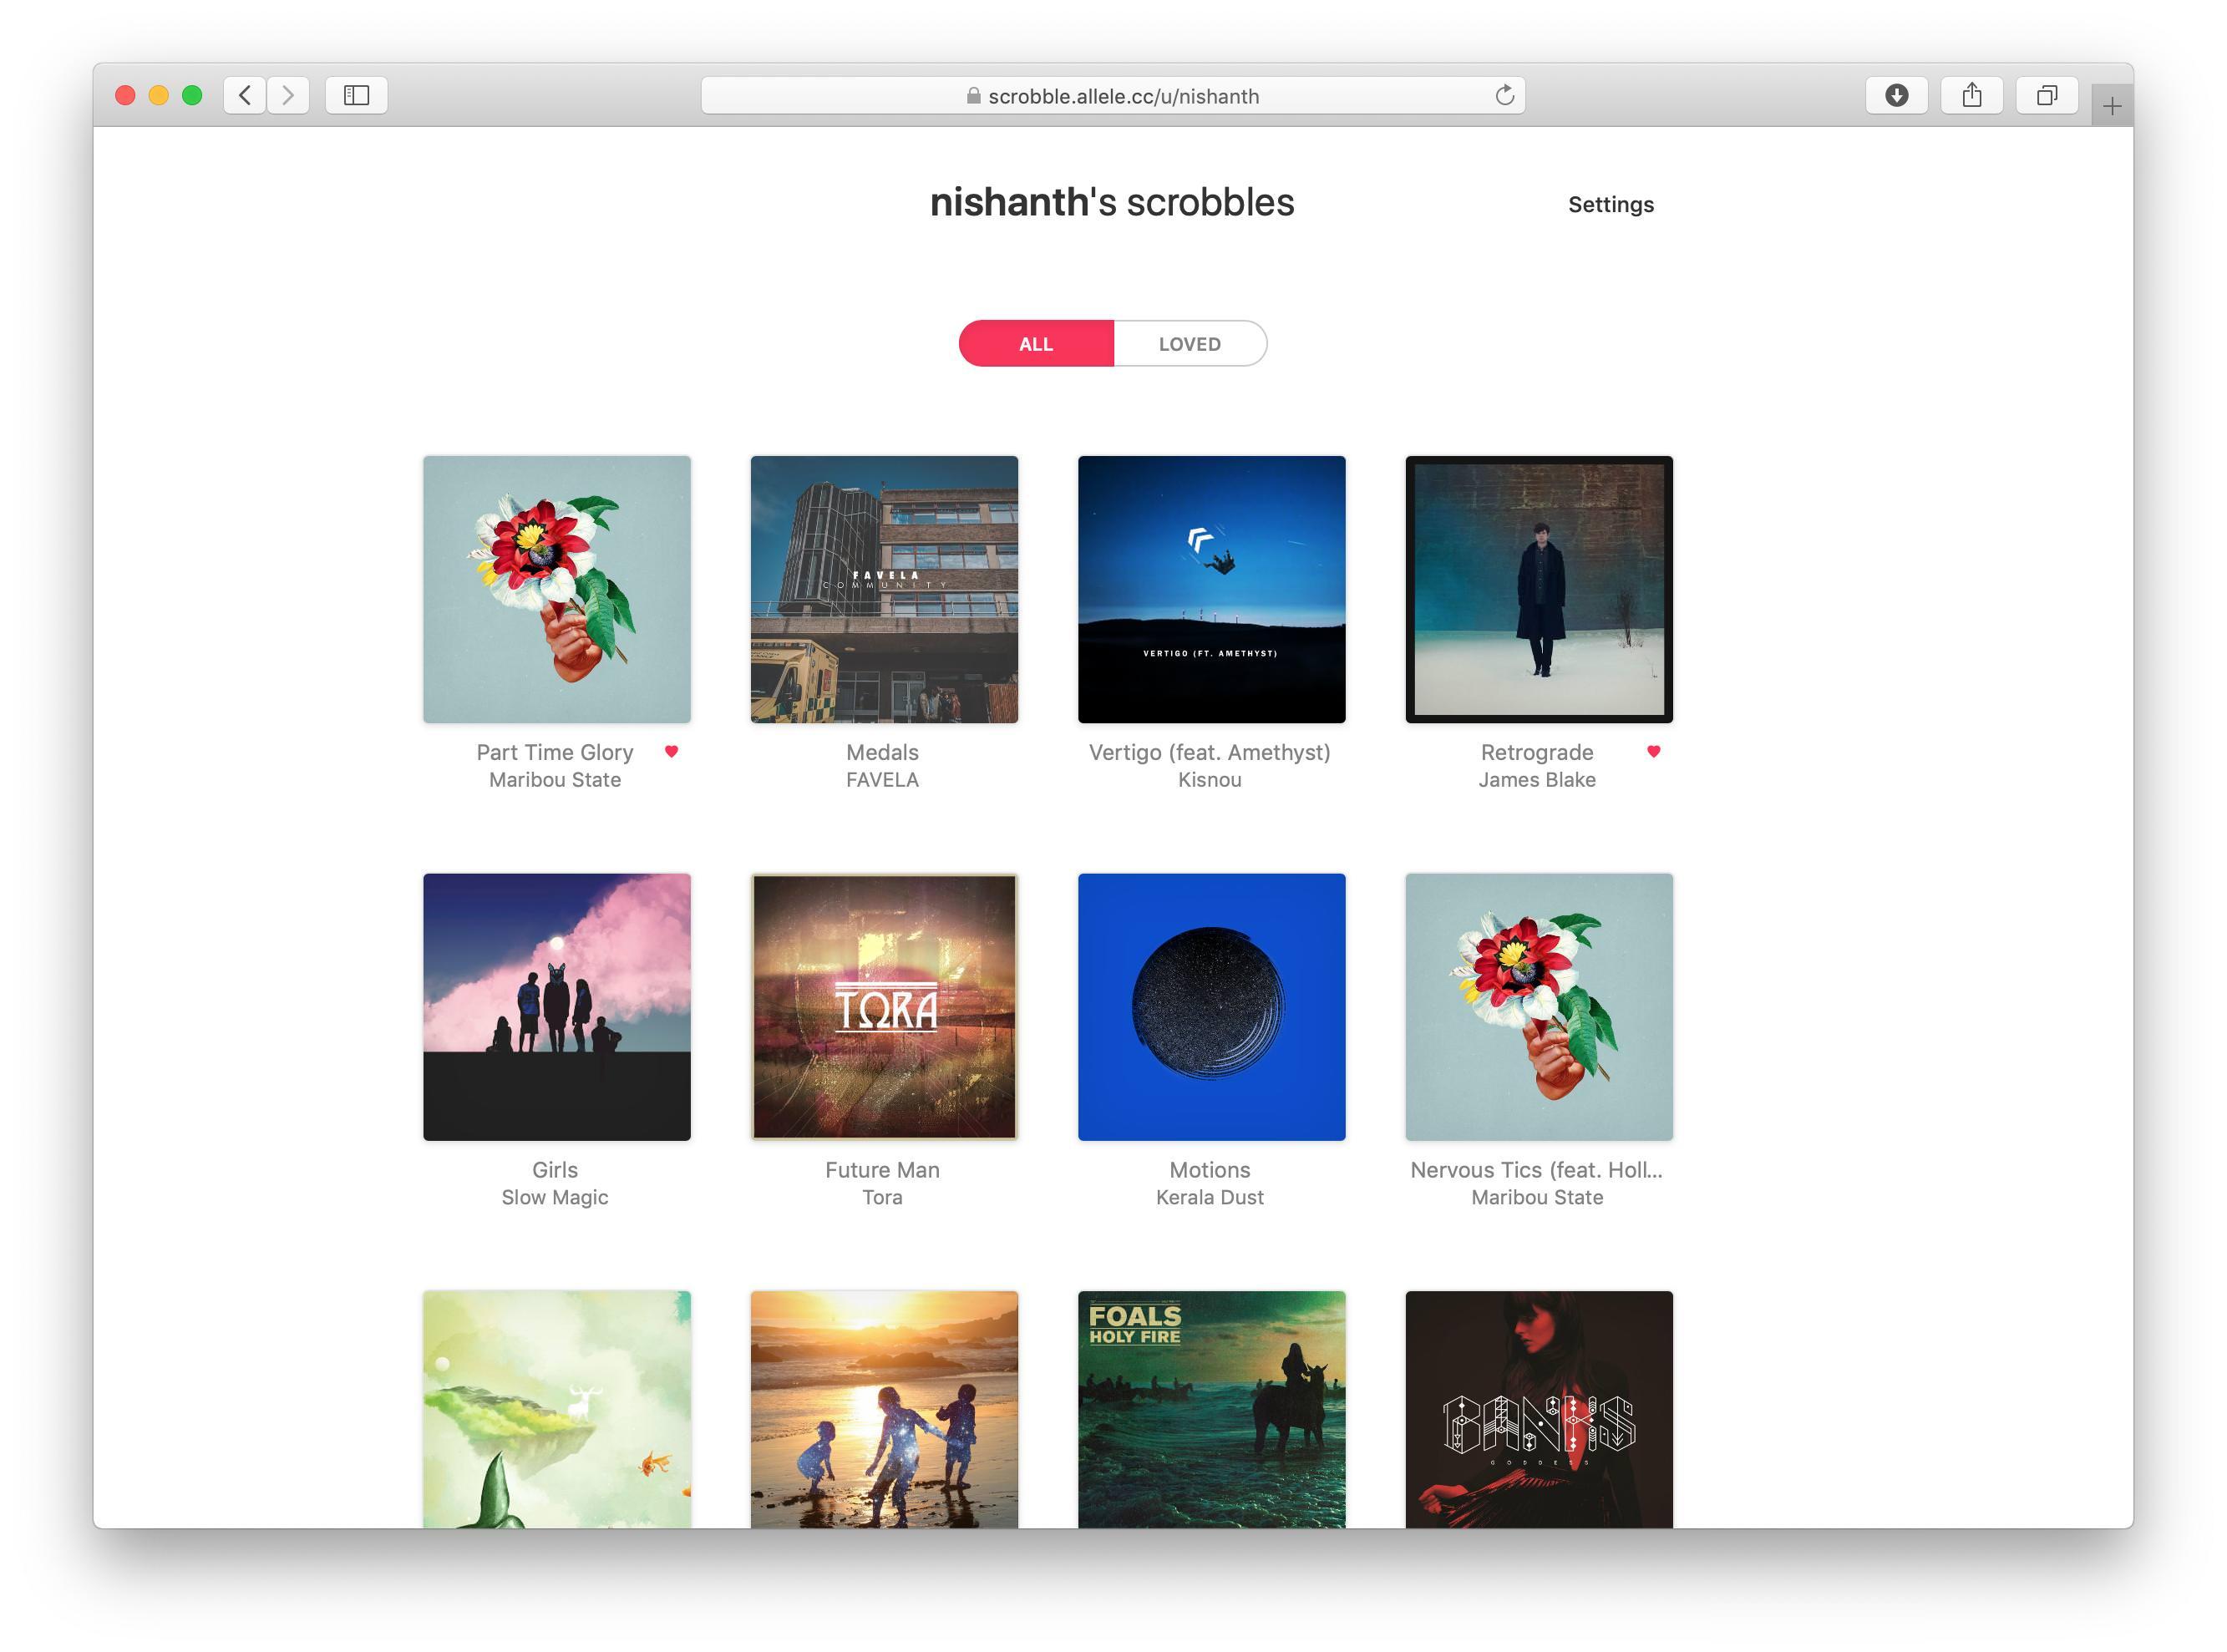 GitHub - nishanths/scrobble: Scrobbling for Apple Music